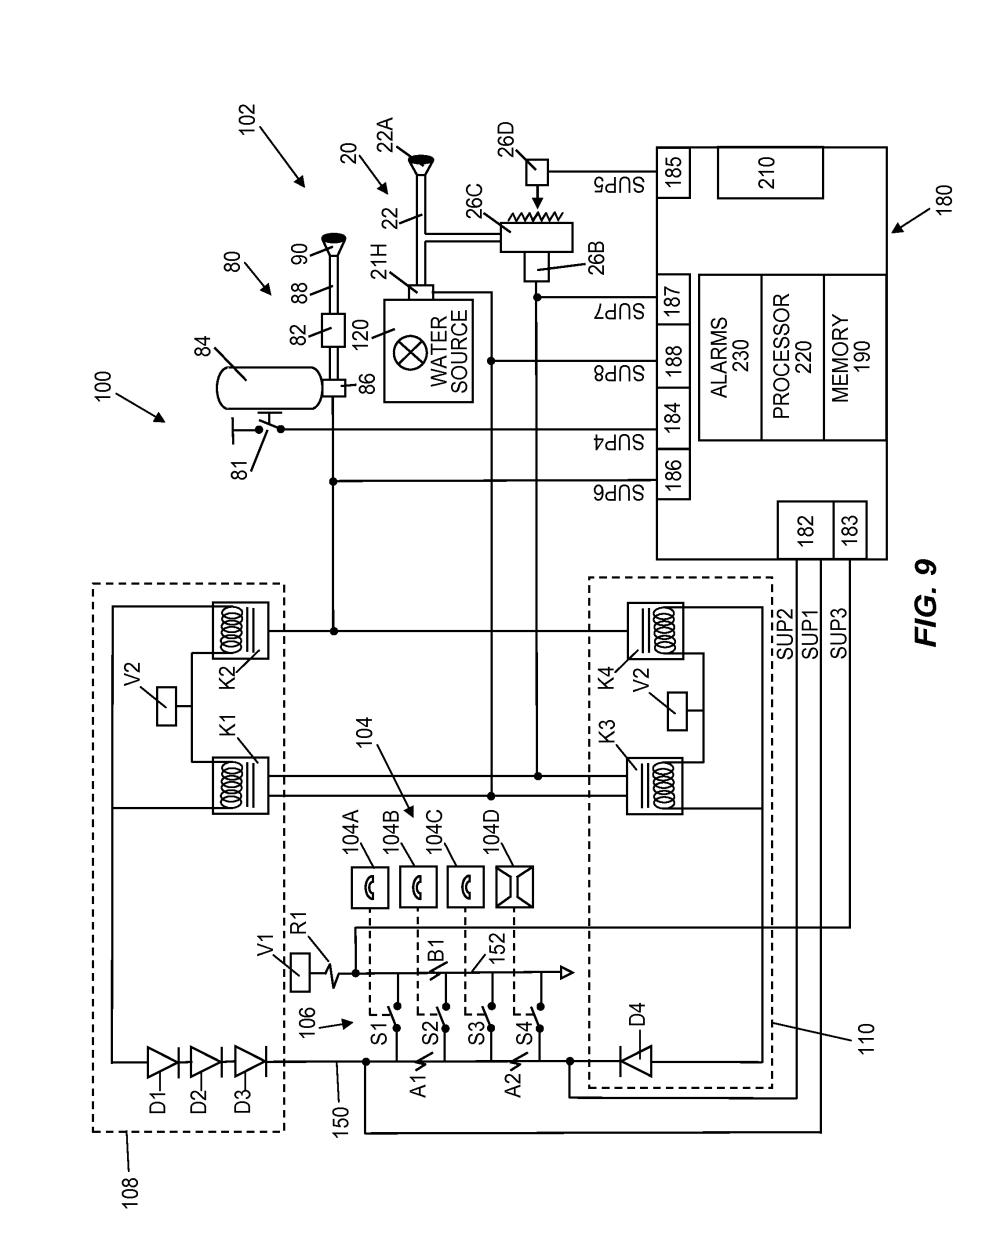 medium resolution of fire suppression system wiring diagram fire alarm system wiring hood ansul system wiring diagram fire control